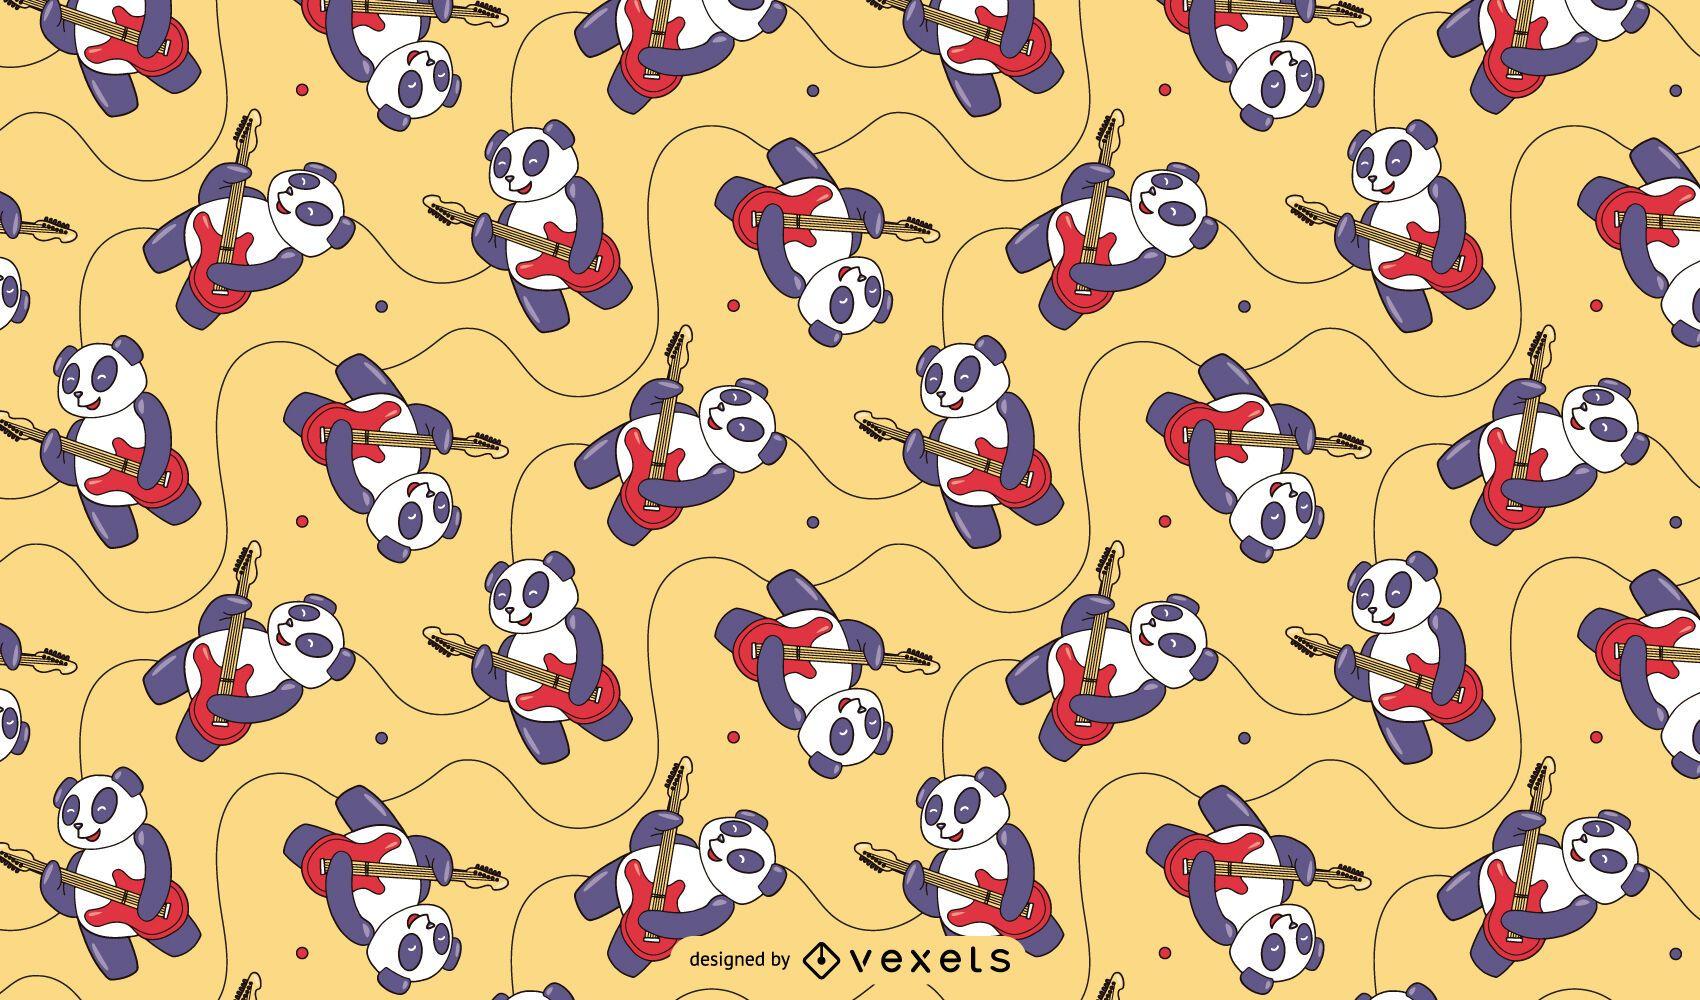 Diseño de patrón de guitarrista de Panda